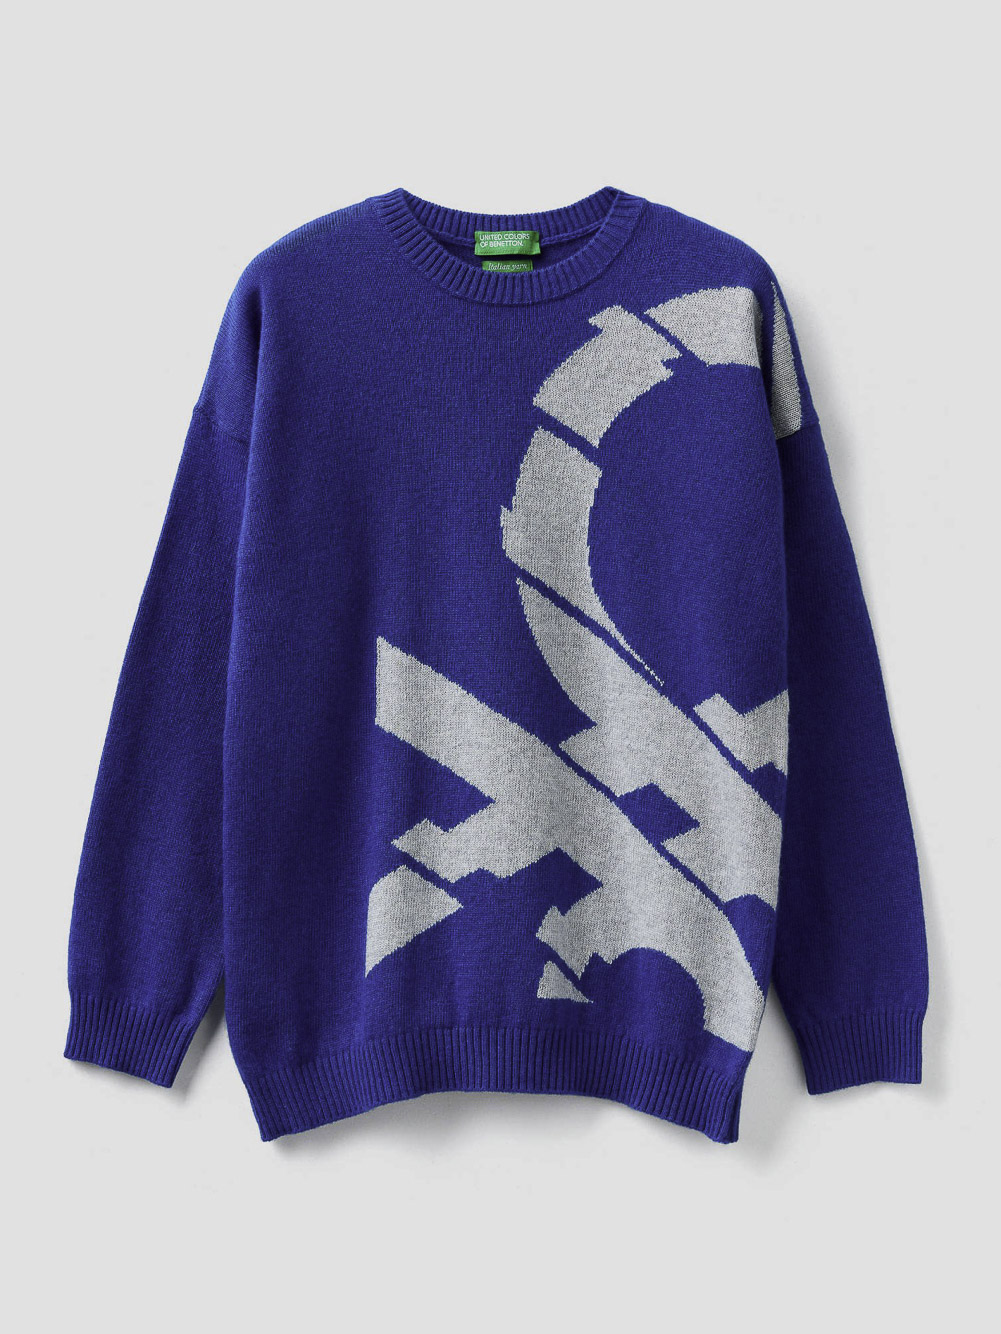 012 BENETTON Μπλούζα λογότυπο 1032Q1930 20A903